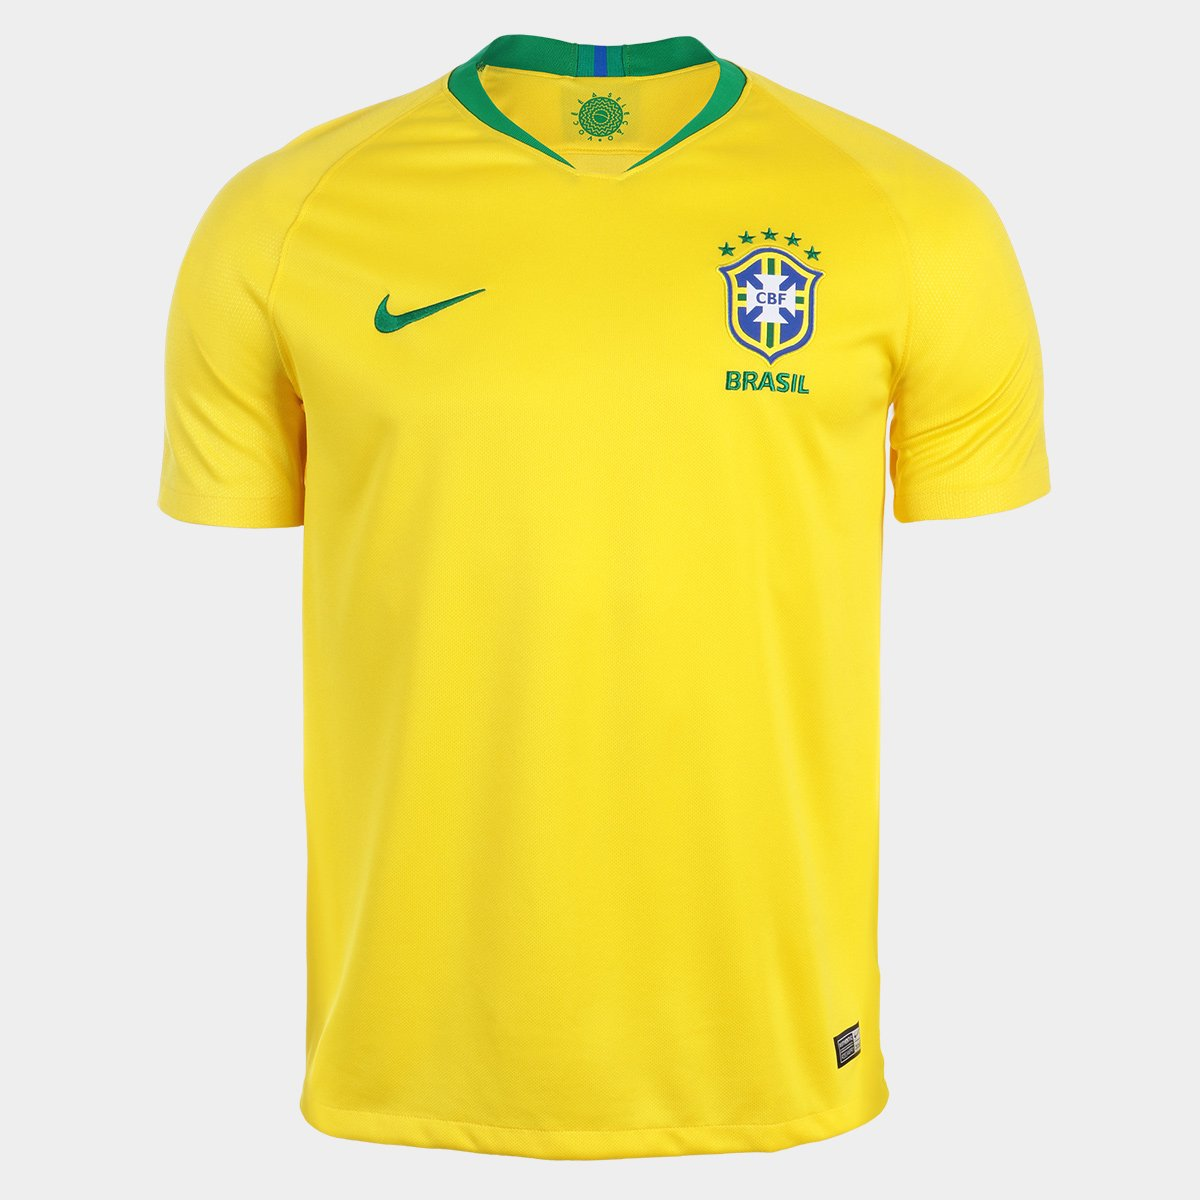 ... Camisa Seleção Brasil I 2018 nº 10 Neymar Jr - Torcedor Nike Masculina  ... 21d97e3b42374